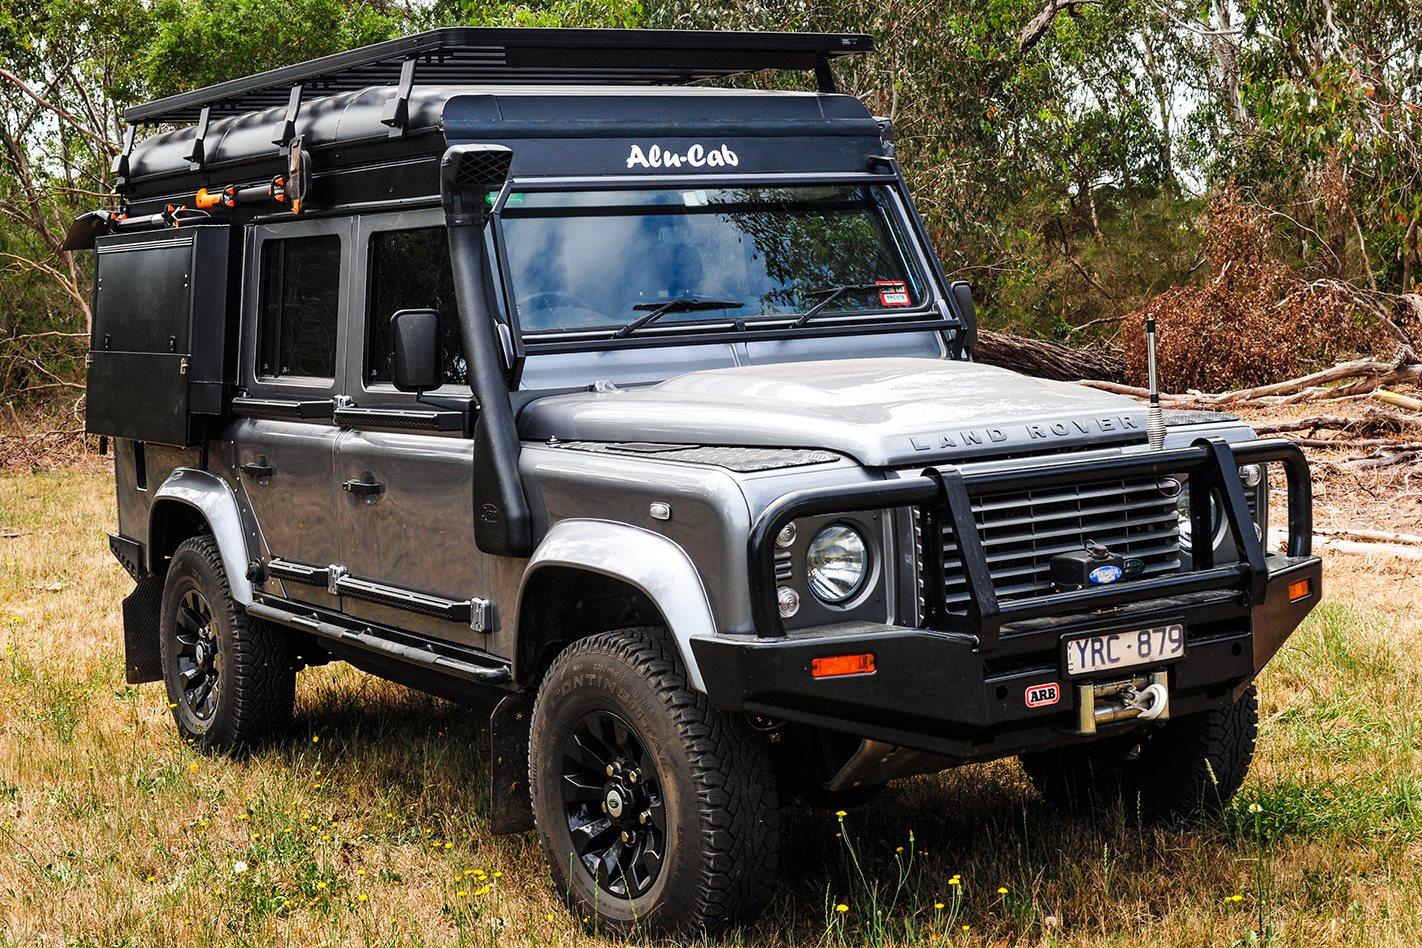 Alu Cab Land Rover Product Test 4x4 Australia